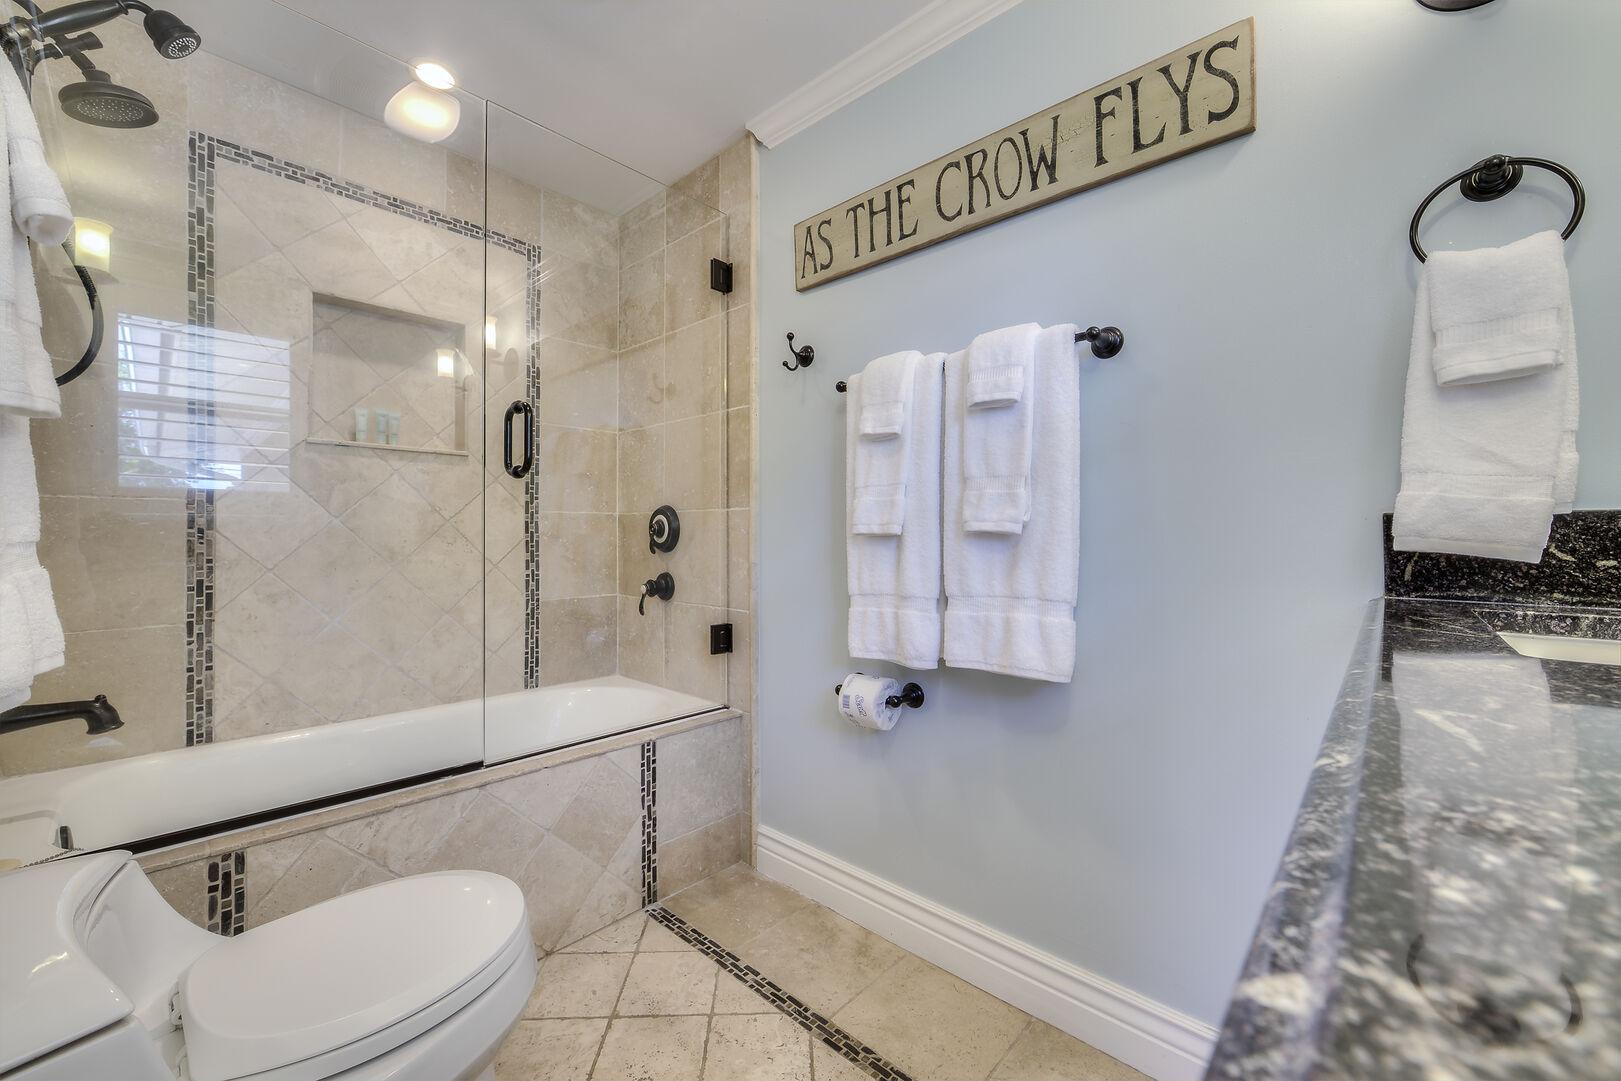 Crow's Nest Shower and Bathroom